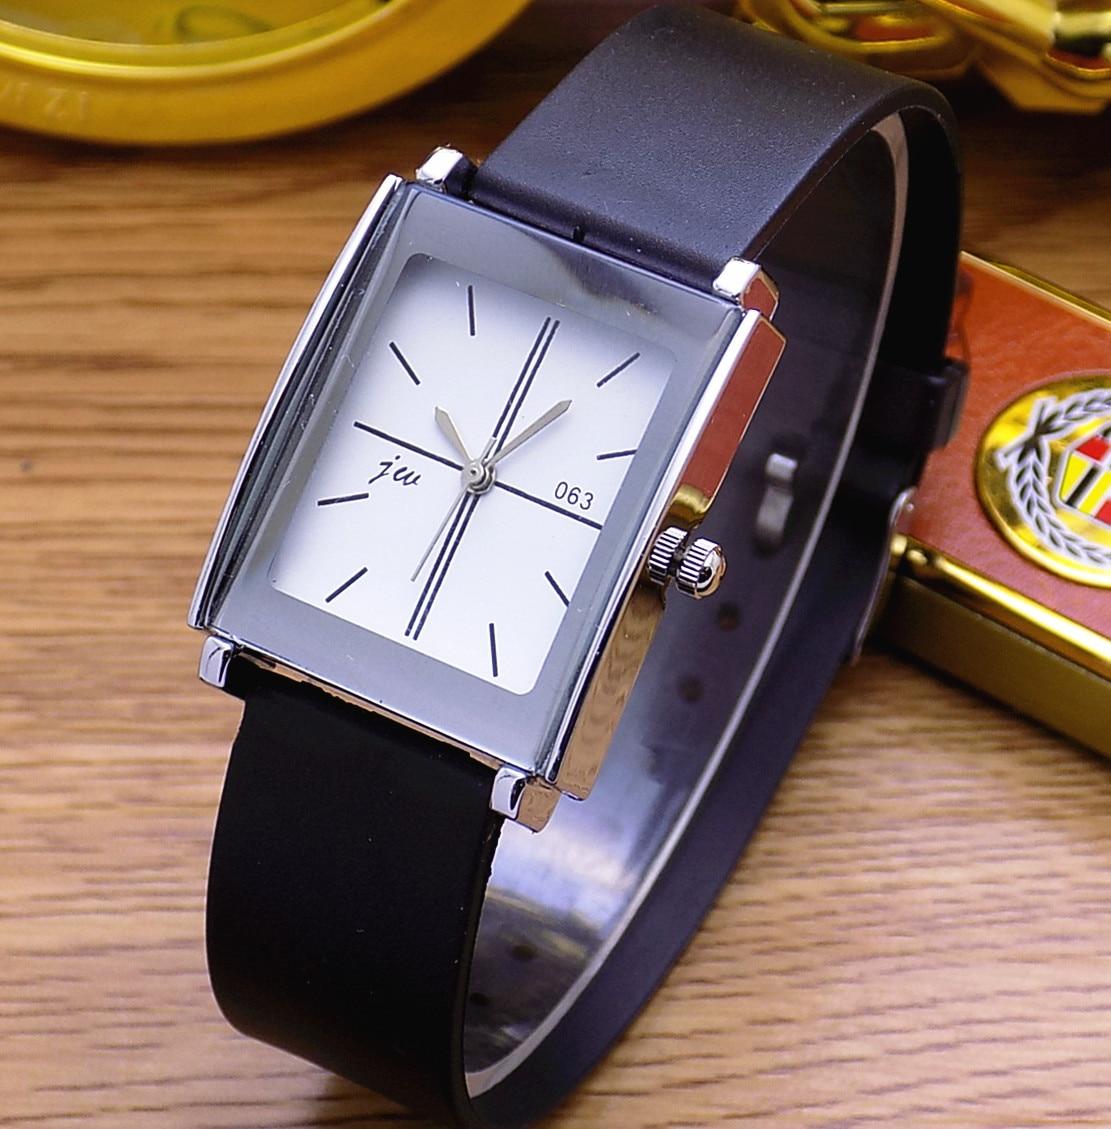 Fashion Jw Brand Casual Quartz Women Men Lover Clock Leather Strap Student Watch Business Square Wristwatches Relogio Masculino(China)